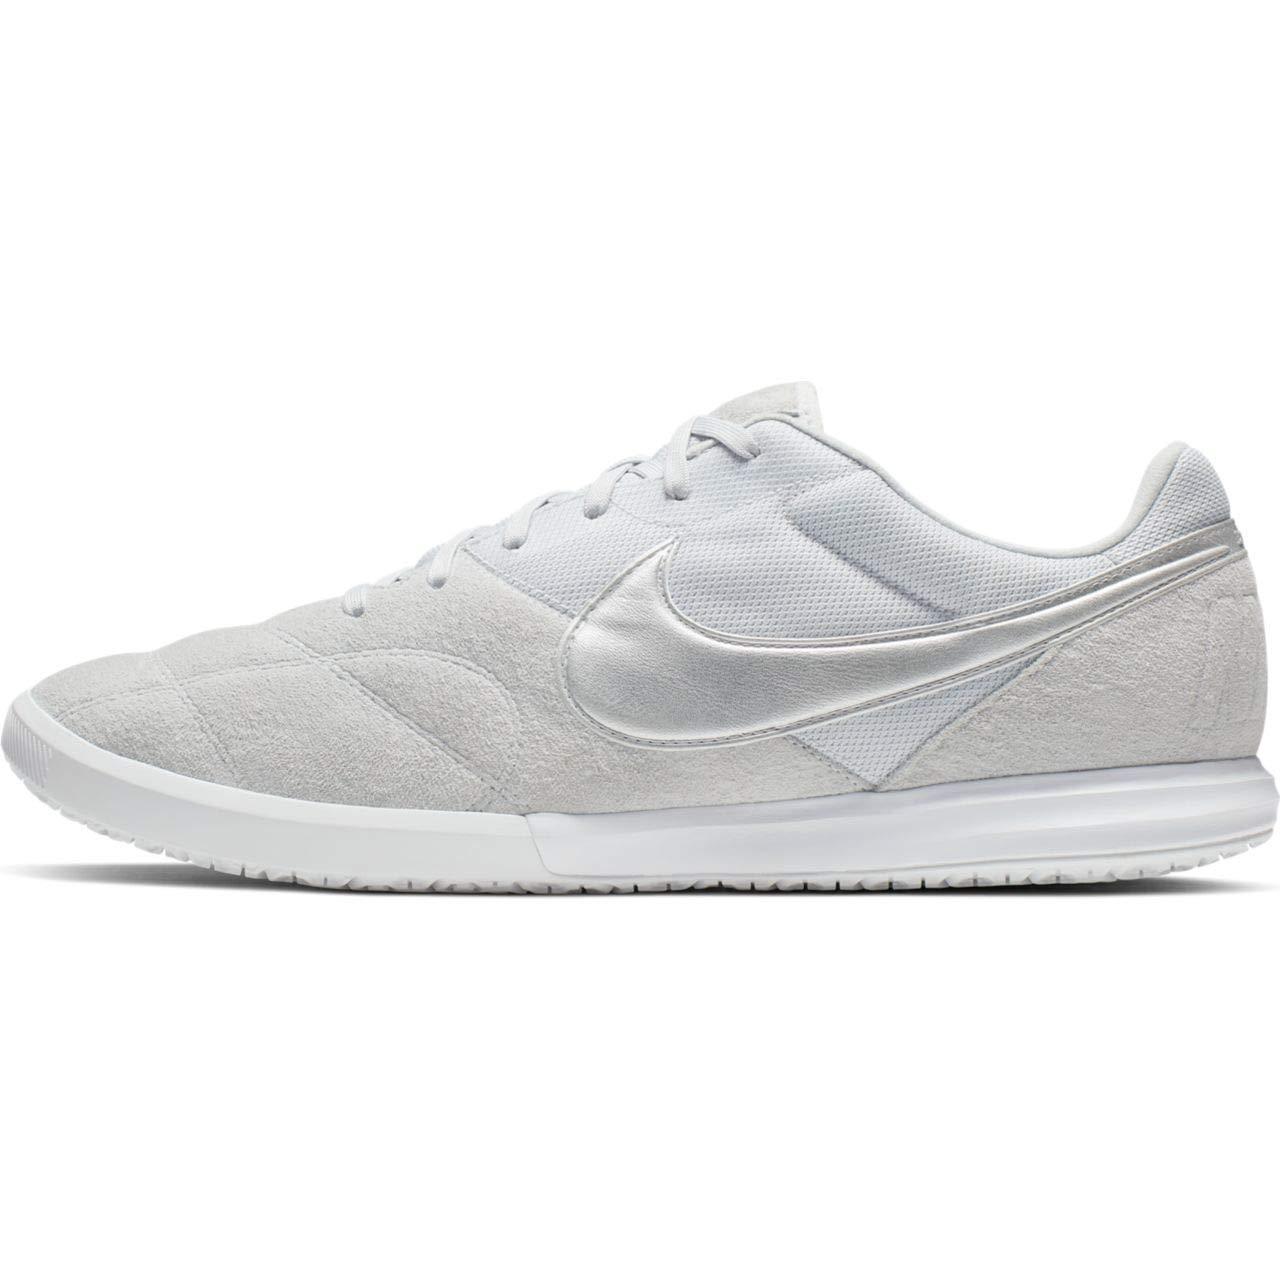 MultiCouleure (Pure Platinum Metallic argent blanc 000) Nike The Premier II Sala, Chaussures de Futsal Mixte Adulte 44 EU